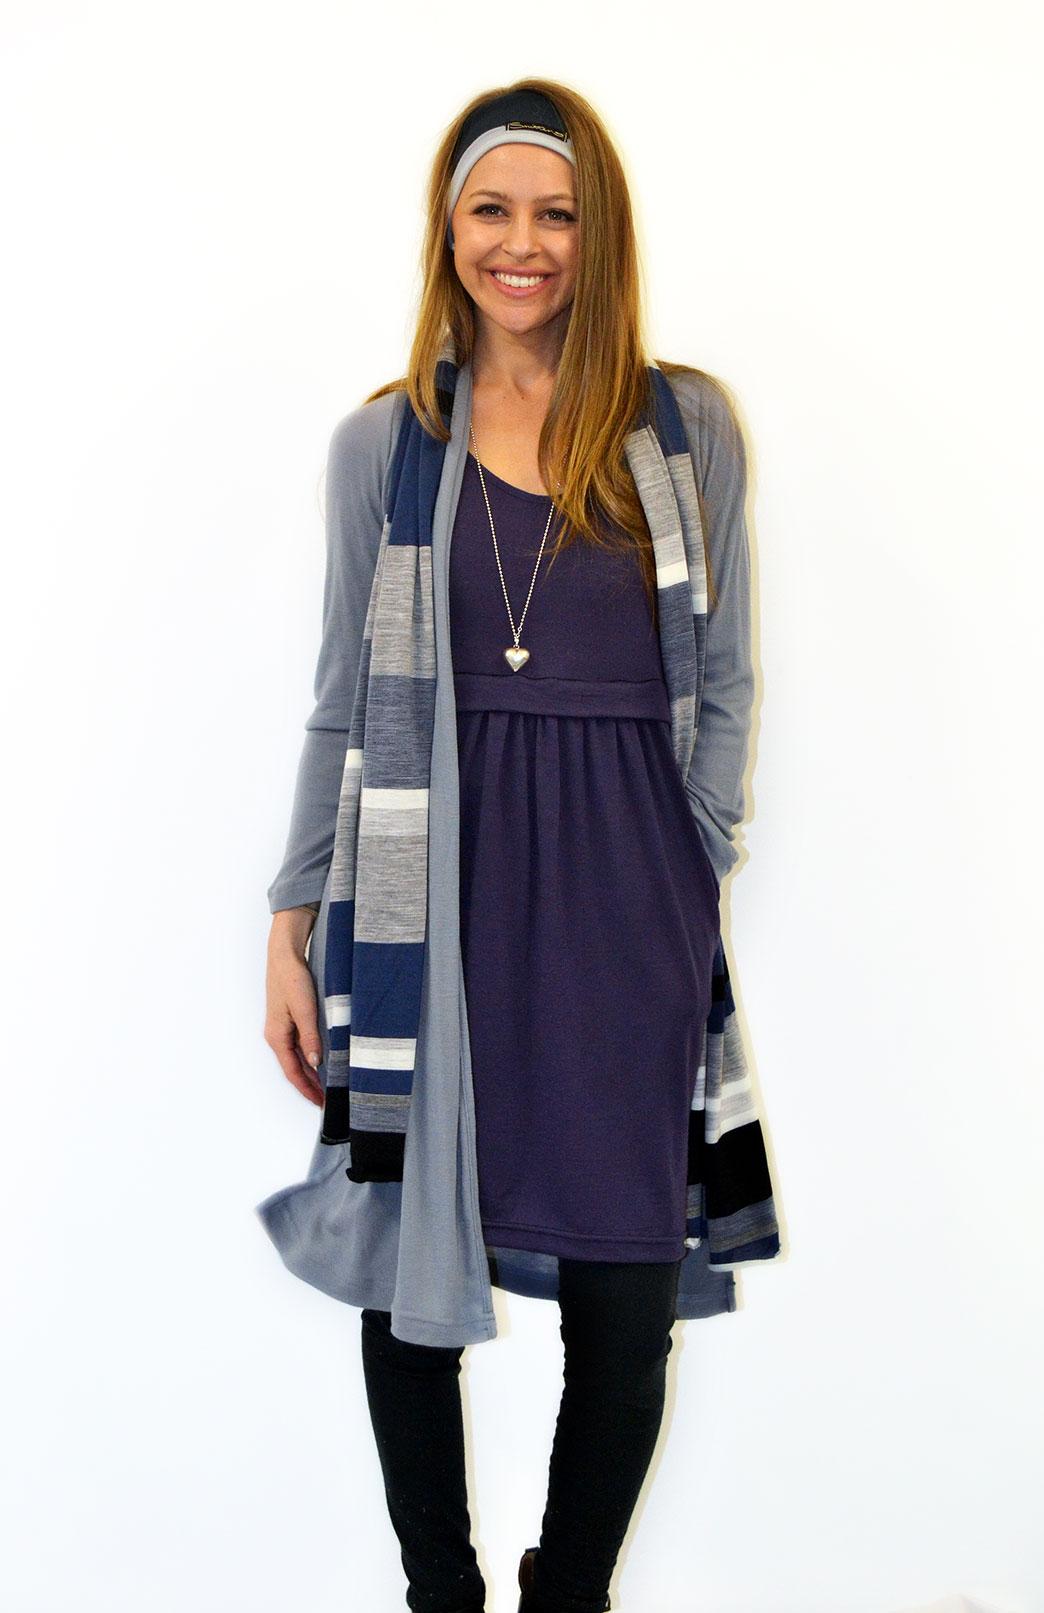 Long Drape Cardigan - Lightweight - Women's Knee Length Armani Grey Merino Wool Waterfall Cardigan - Smitten Merino Tasmania Australia